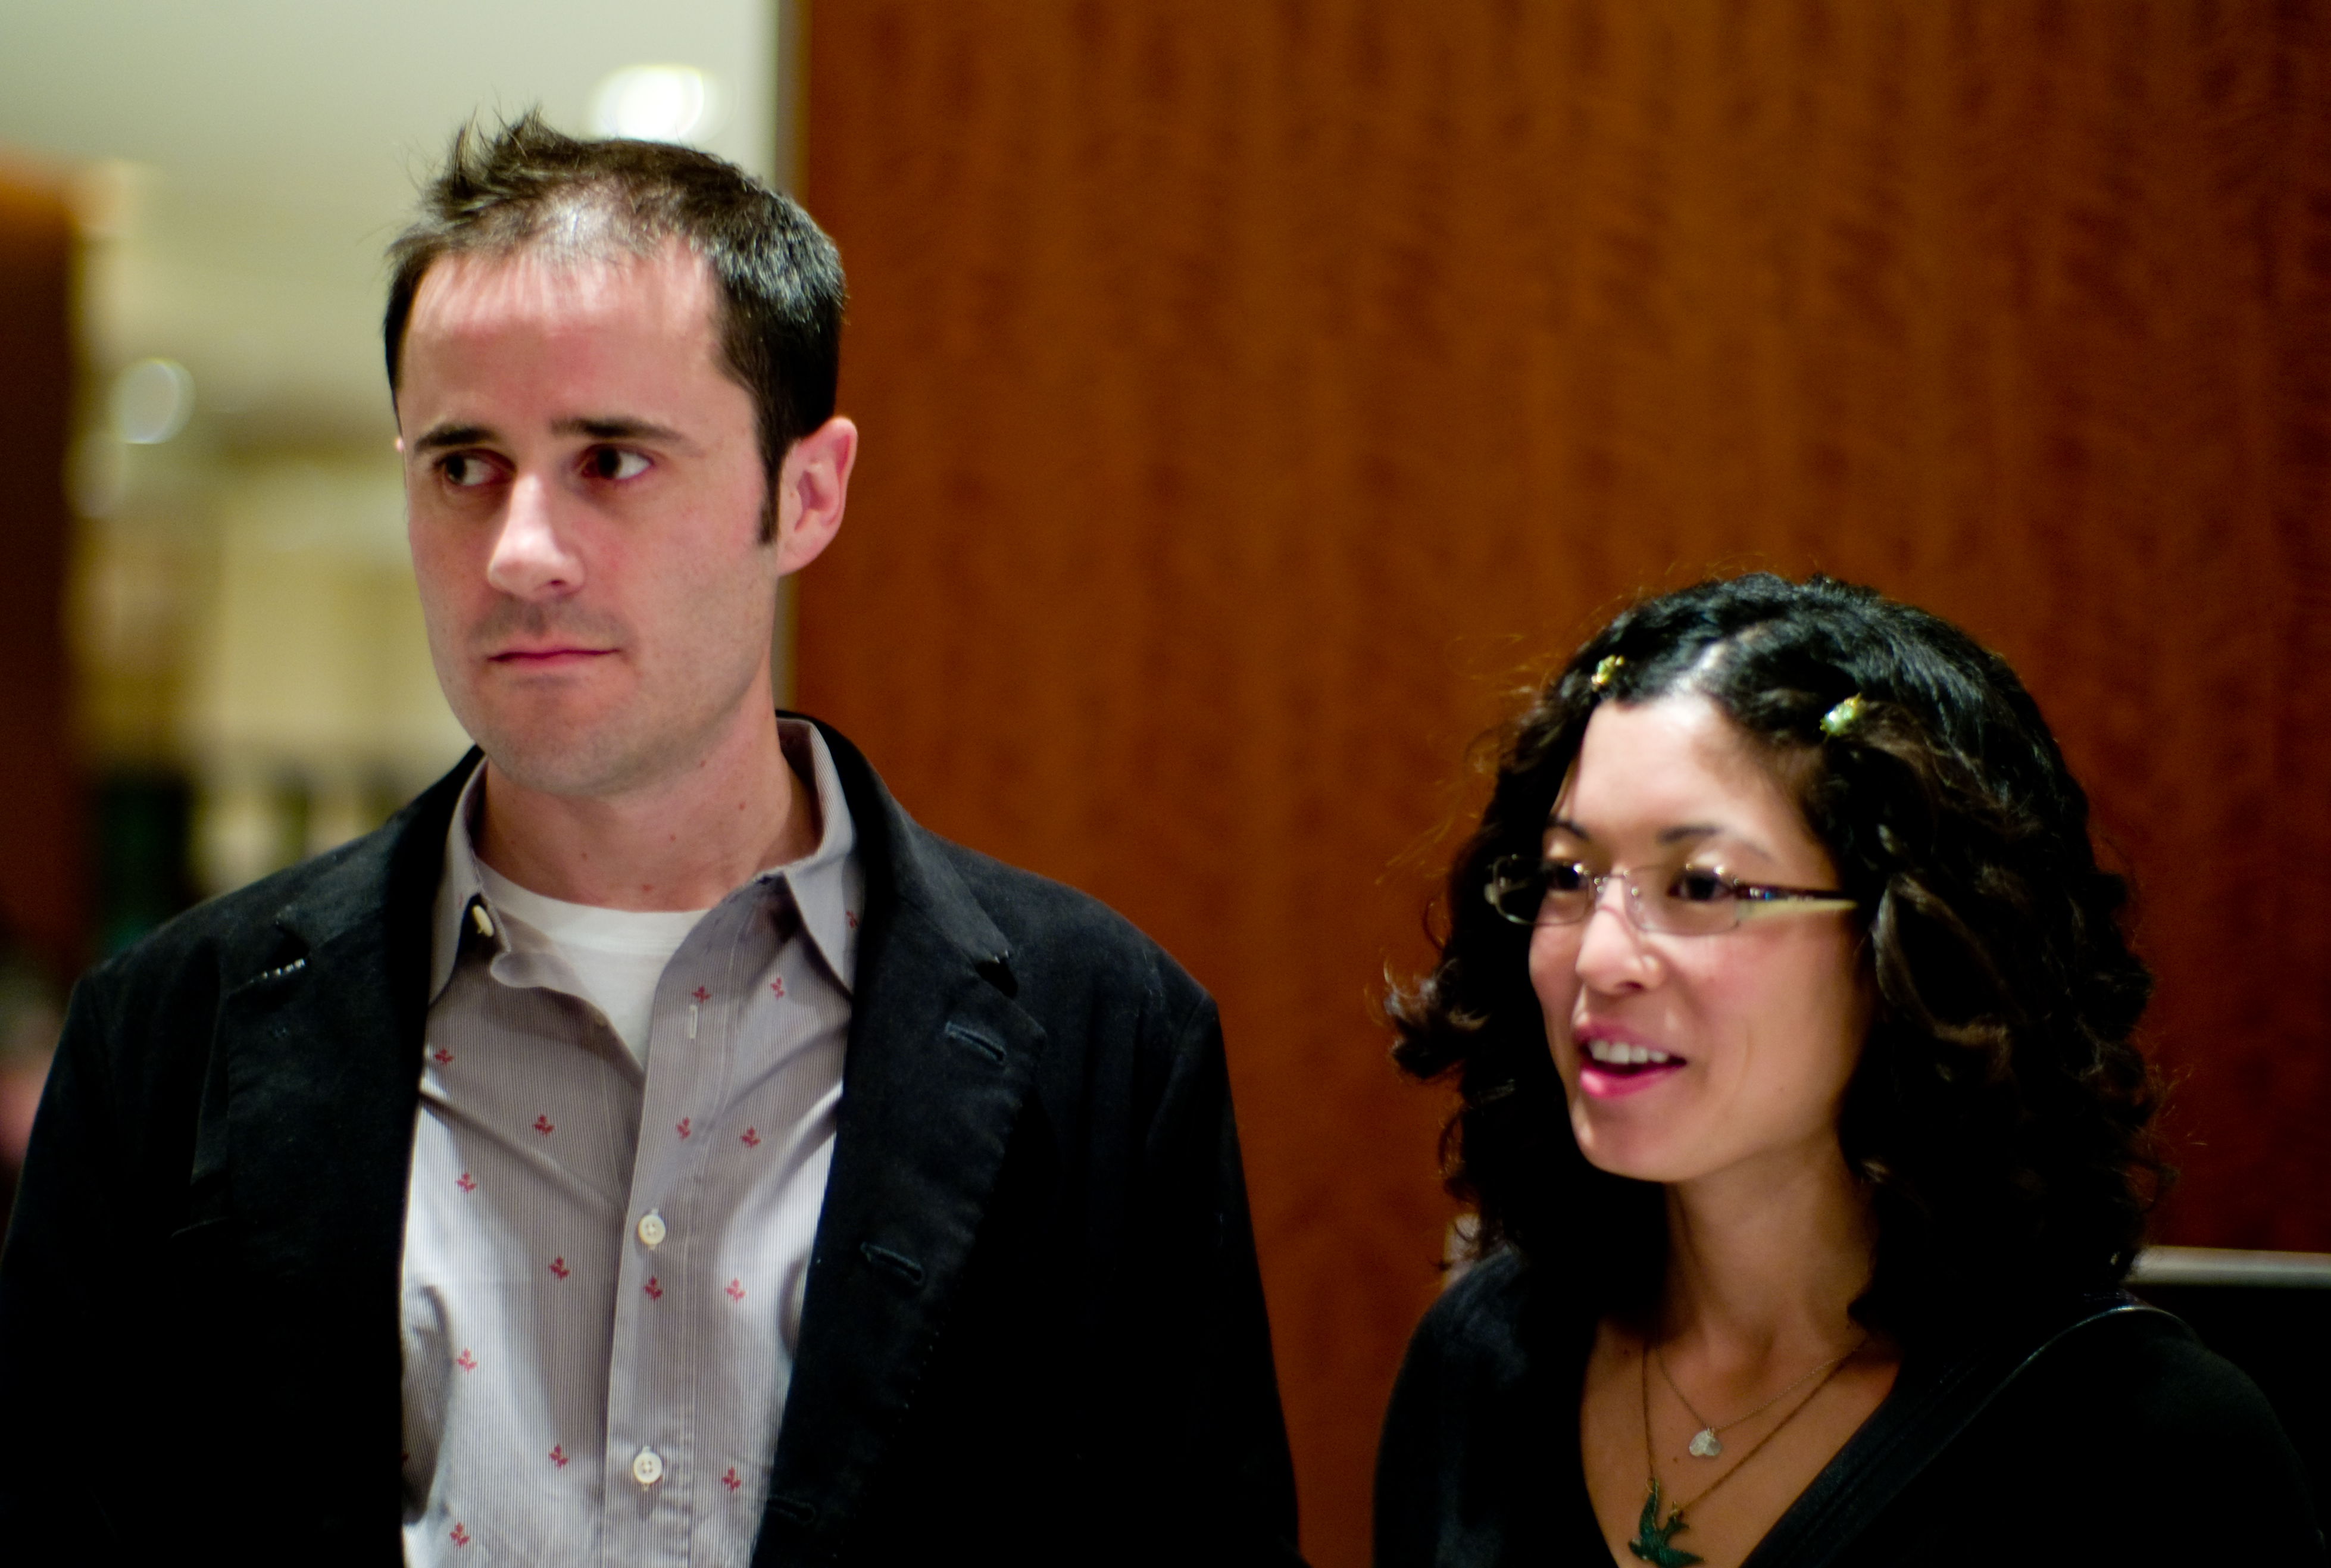 Evan Williams Sara Morishige File:evan Williams And Sara